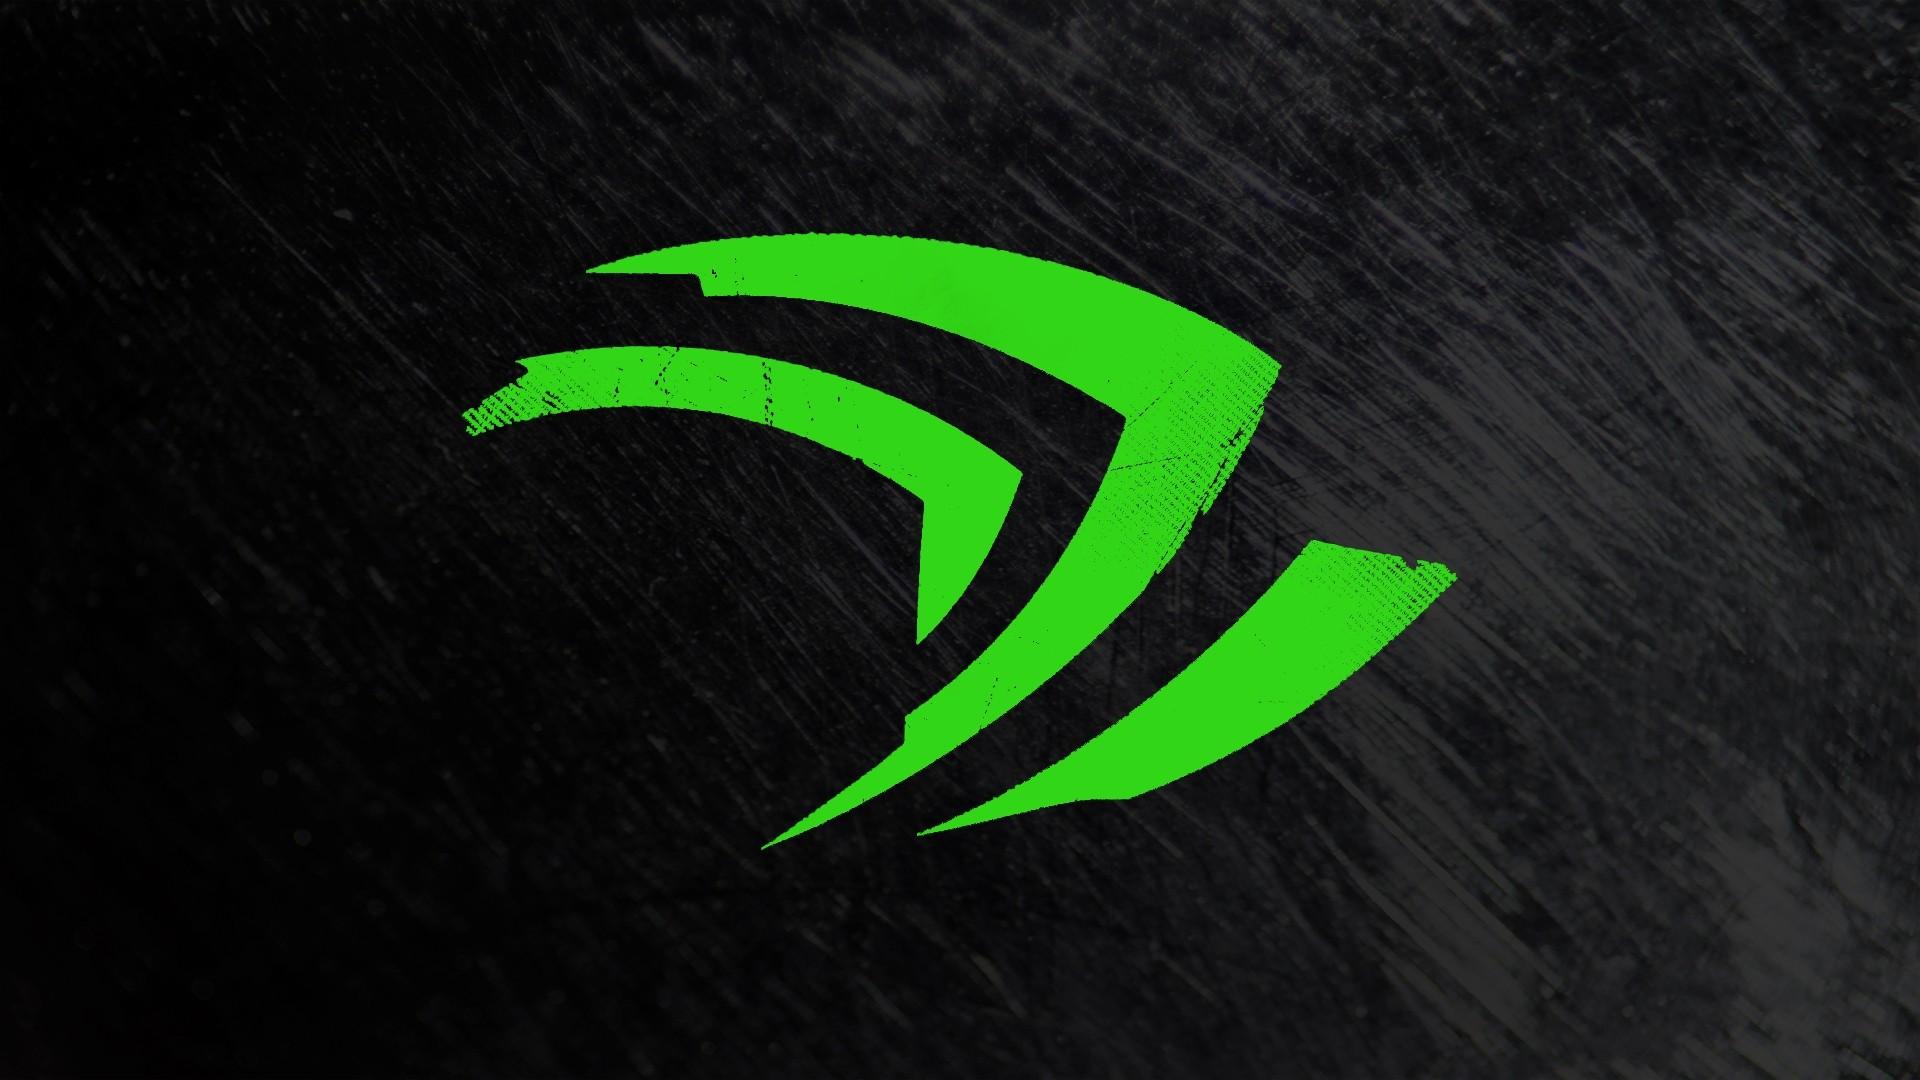 Nvidia Wallpaper Picture hd